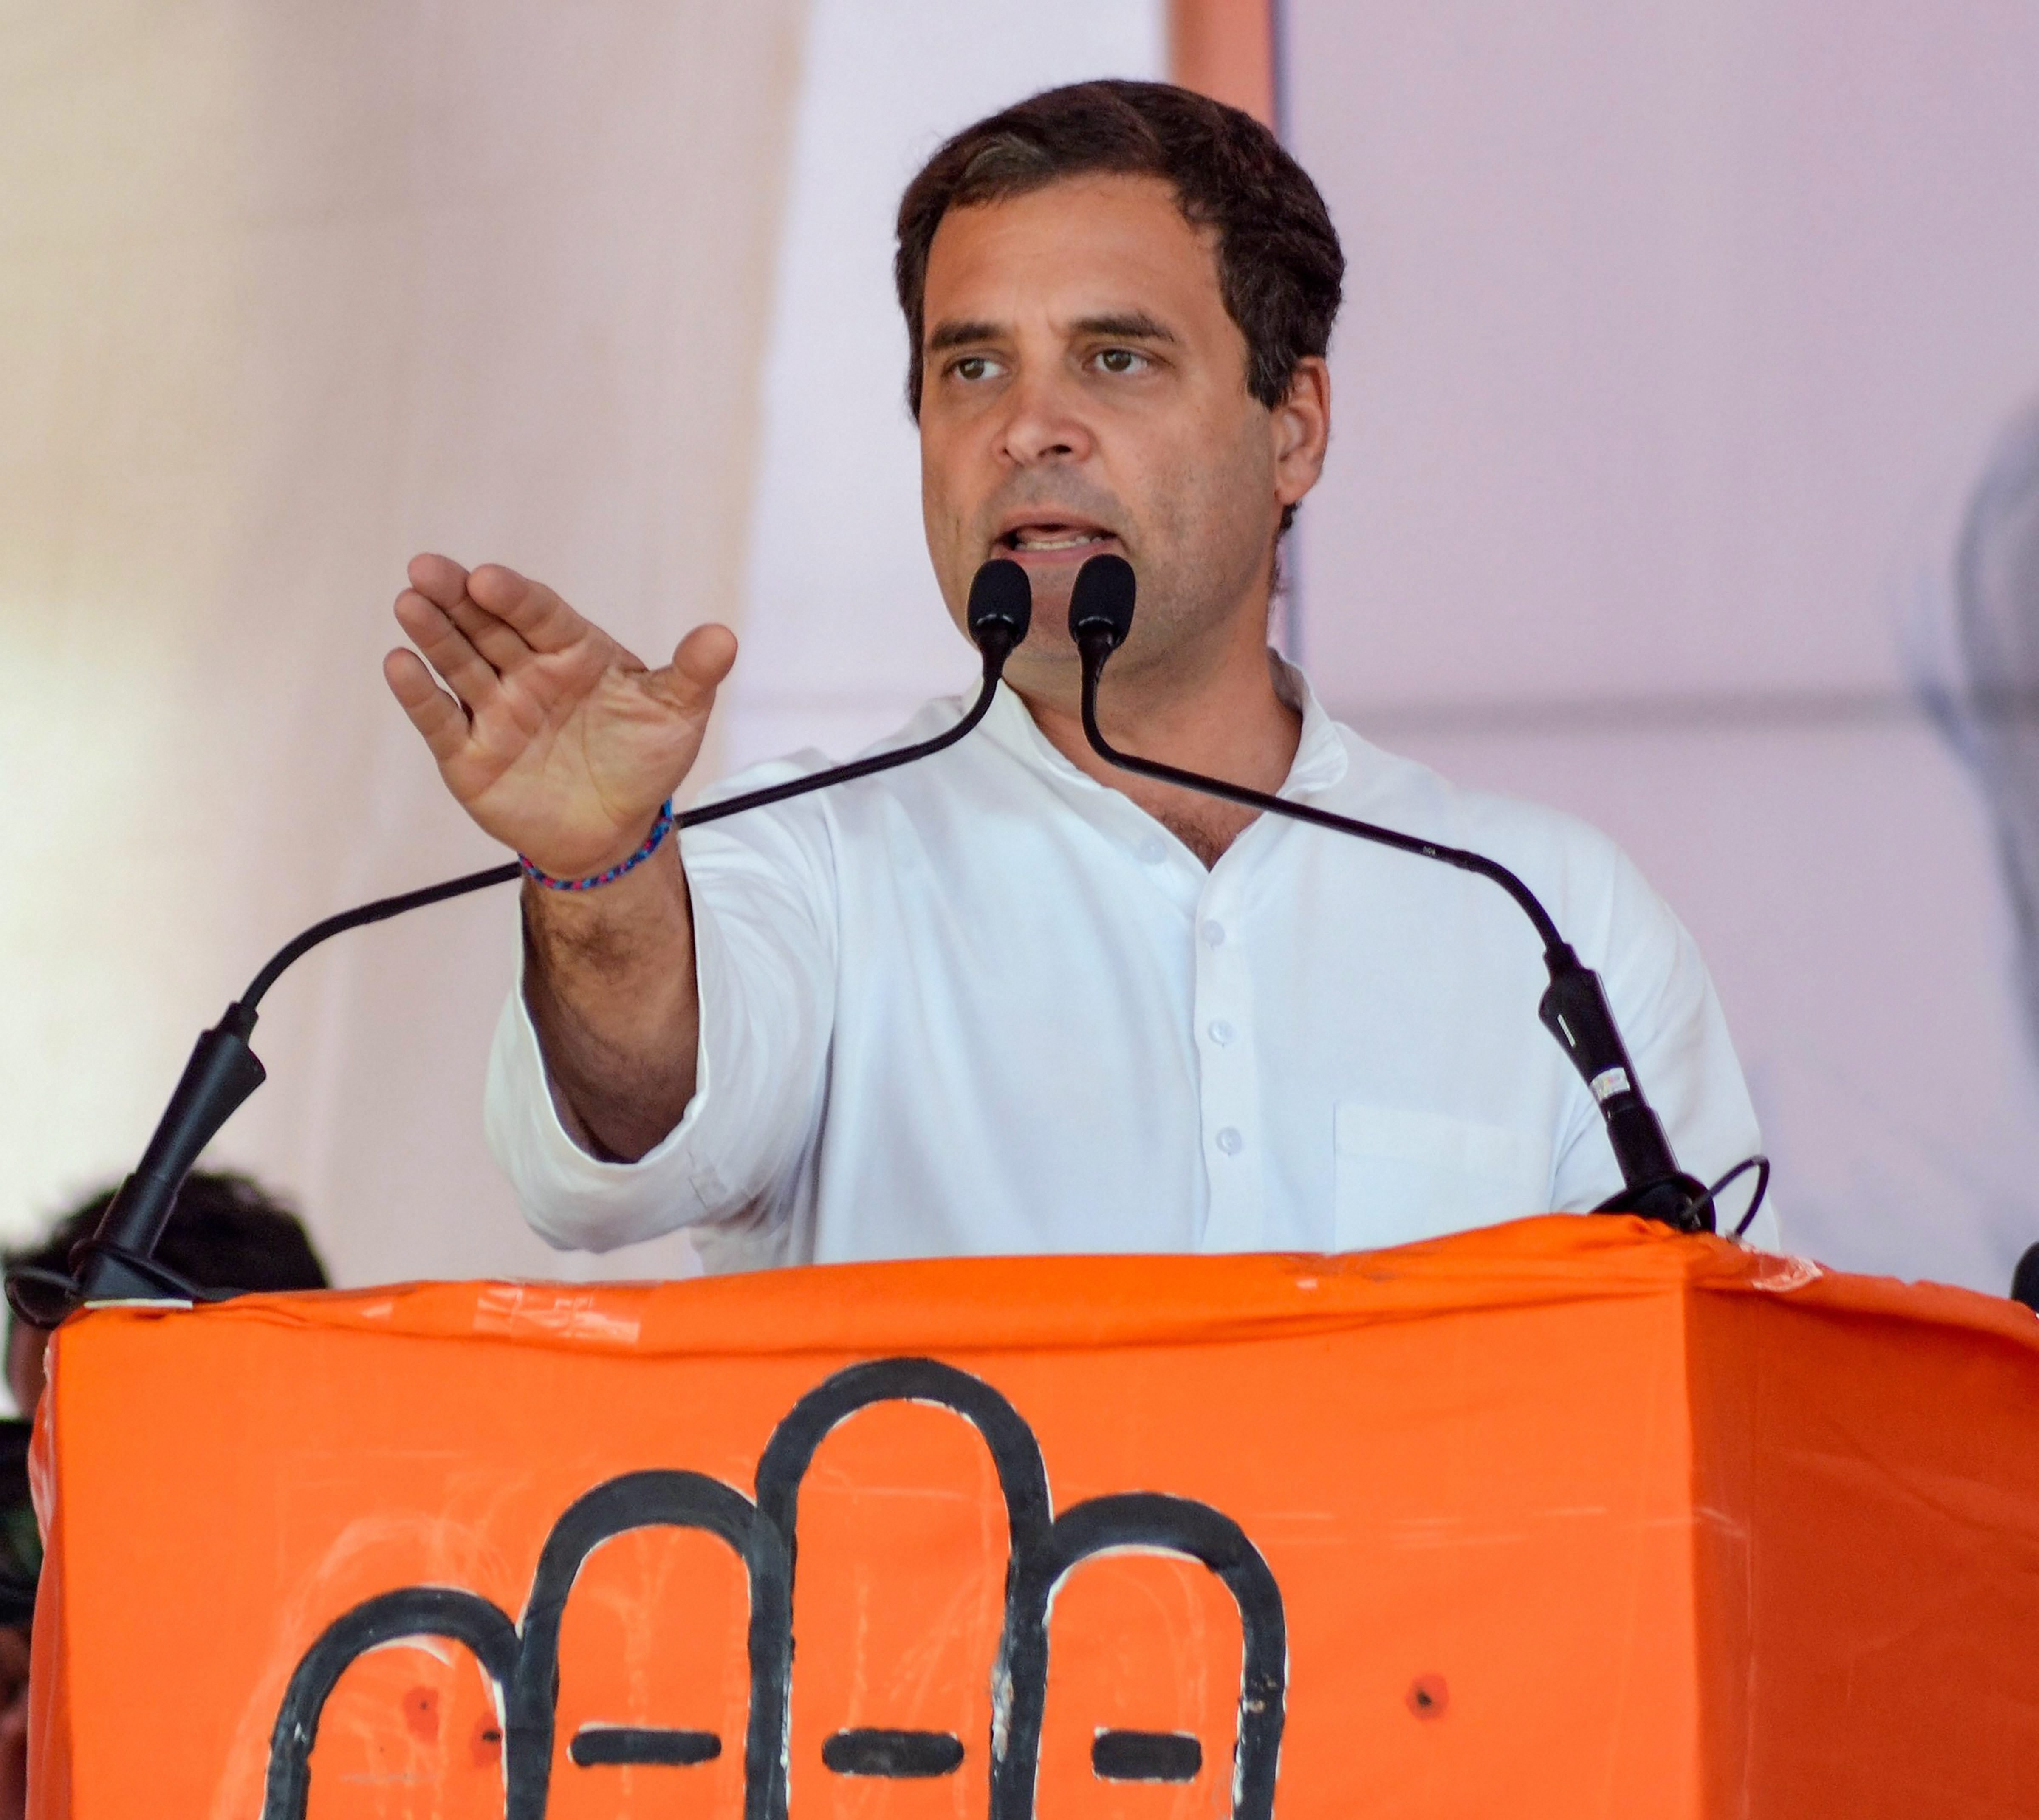 Rahul Gandhi had said on Saturday that Narendra Modi does not understand Hinduism.